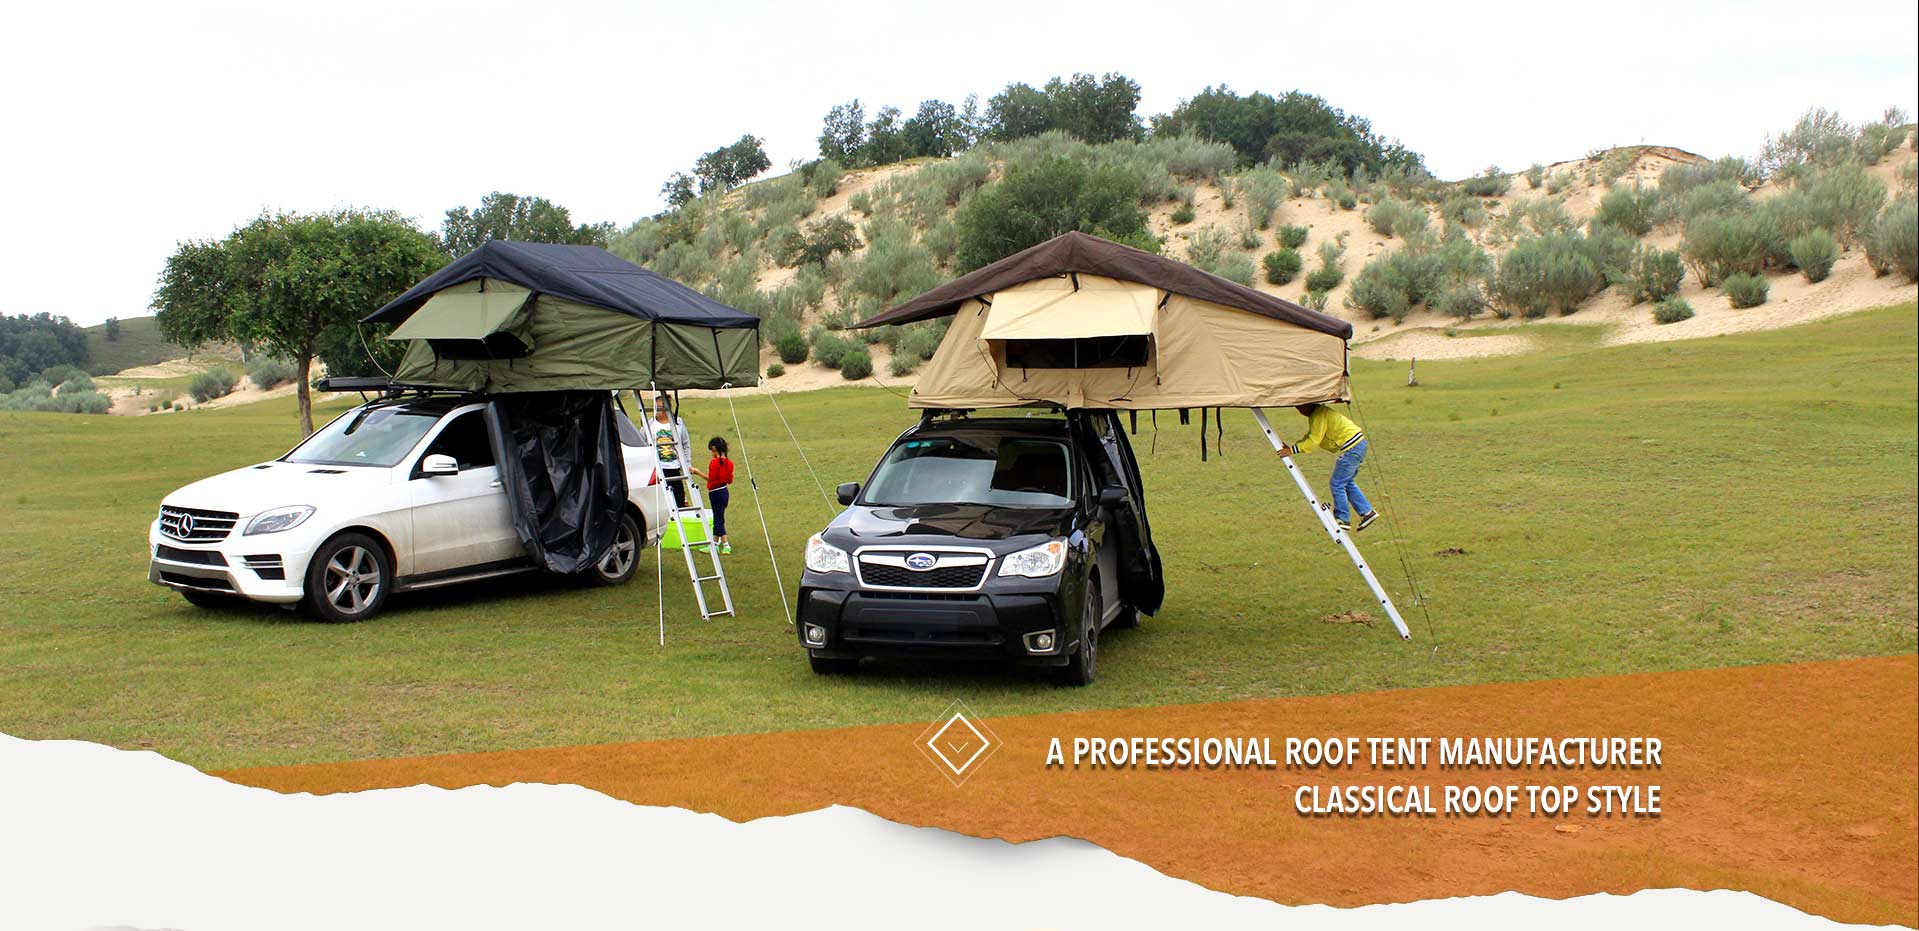 Roof Tent Manufacturer